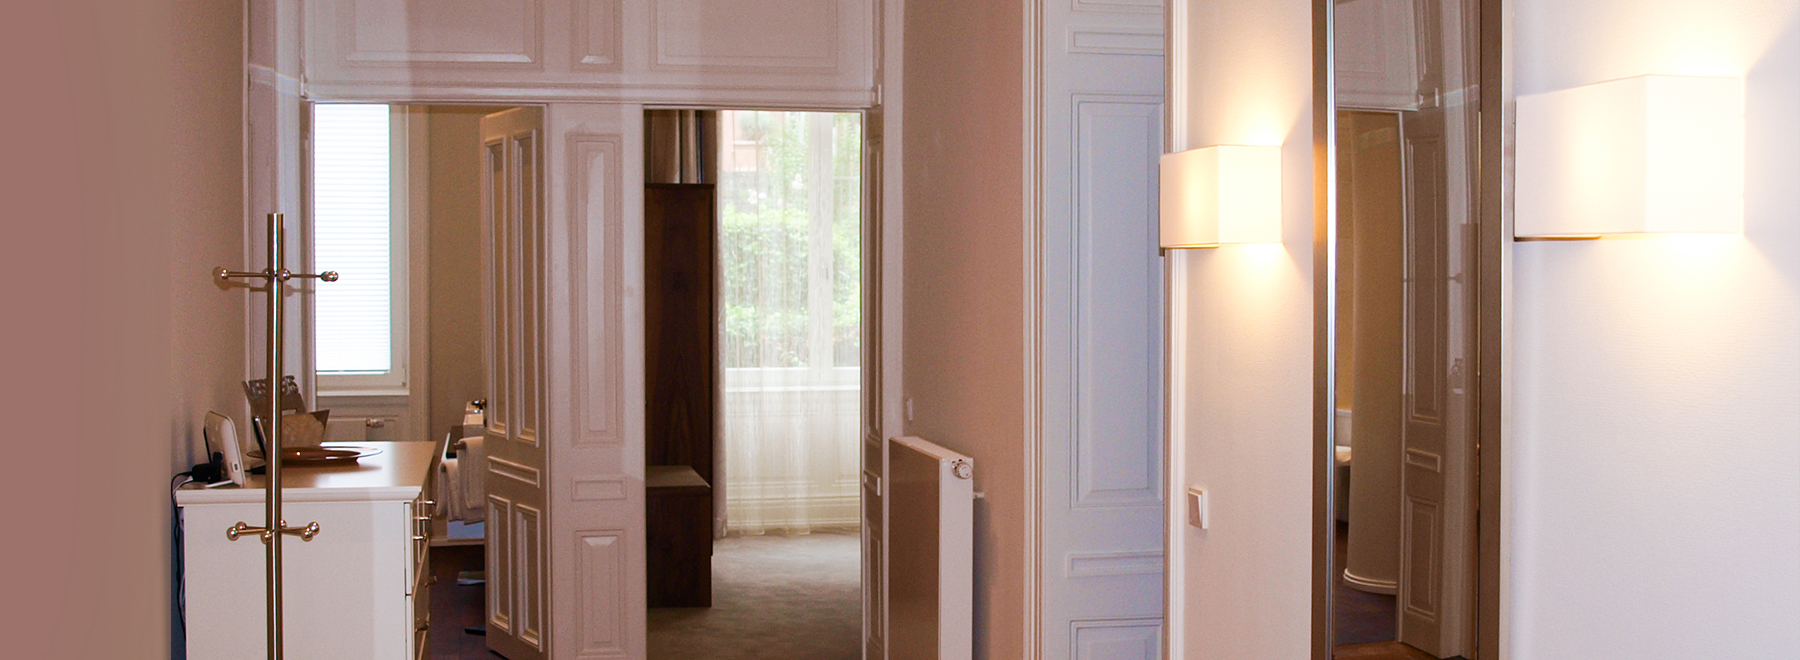 Residences Hotel Oranien